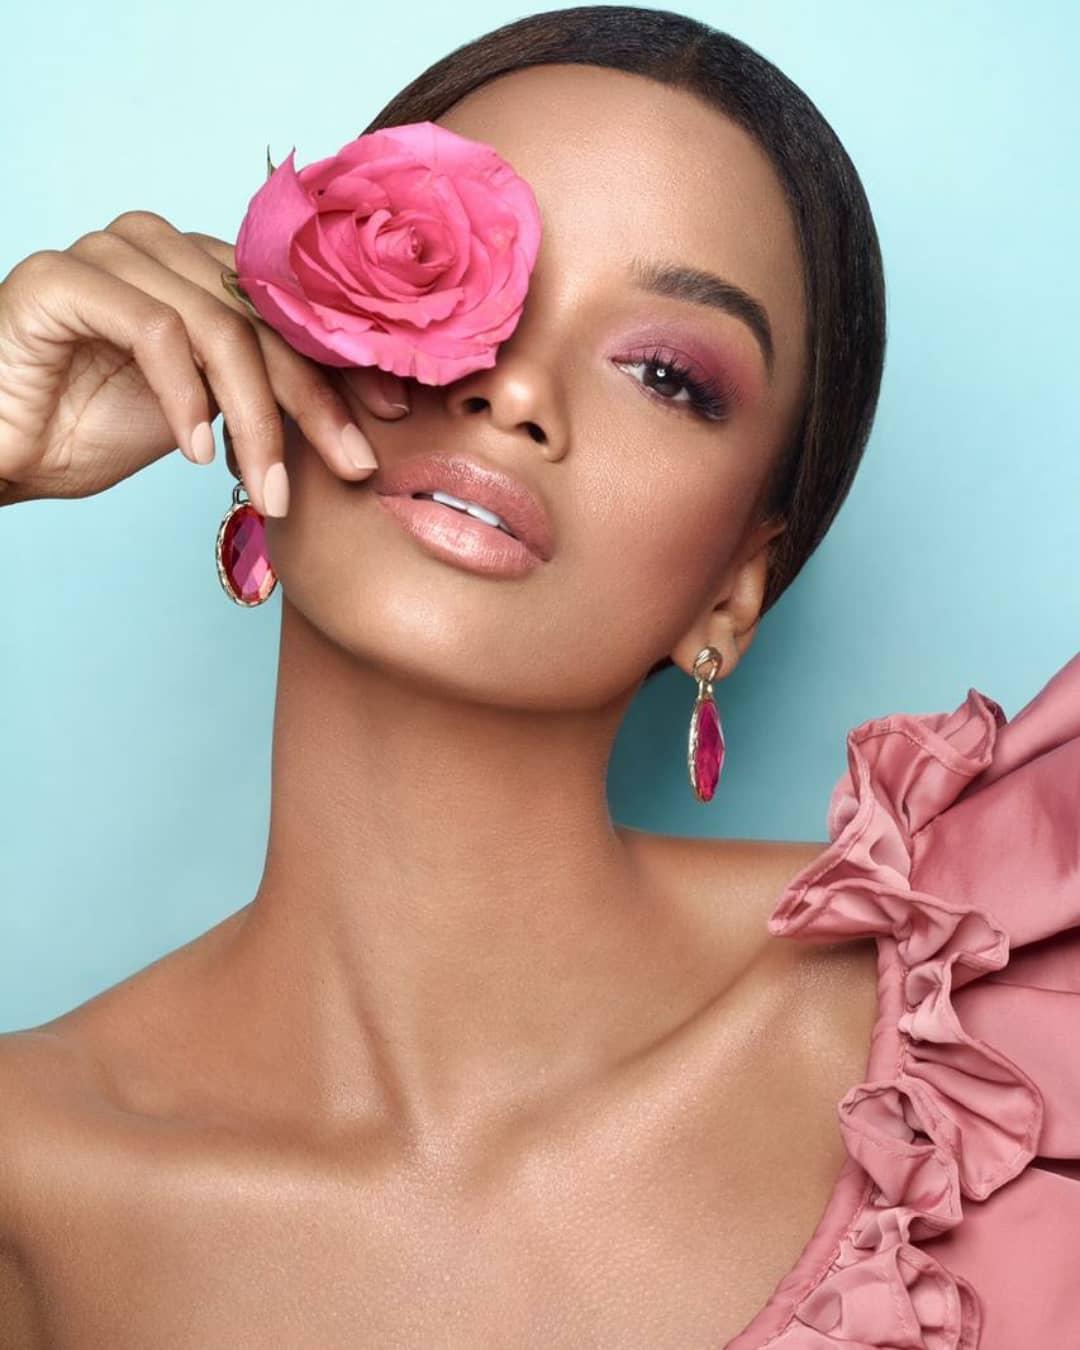 carolina londono, top 16 de miss colombia universo 2020. Carolo14